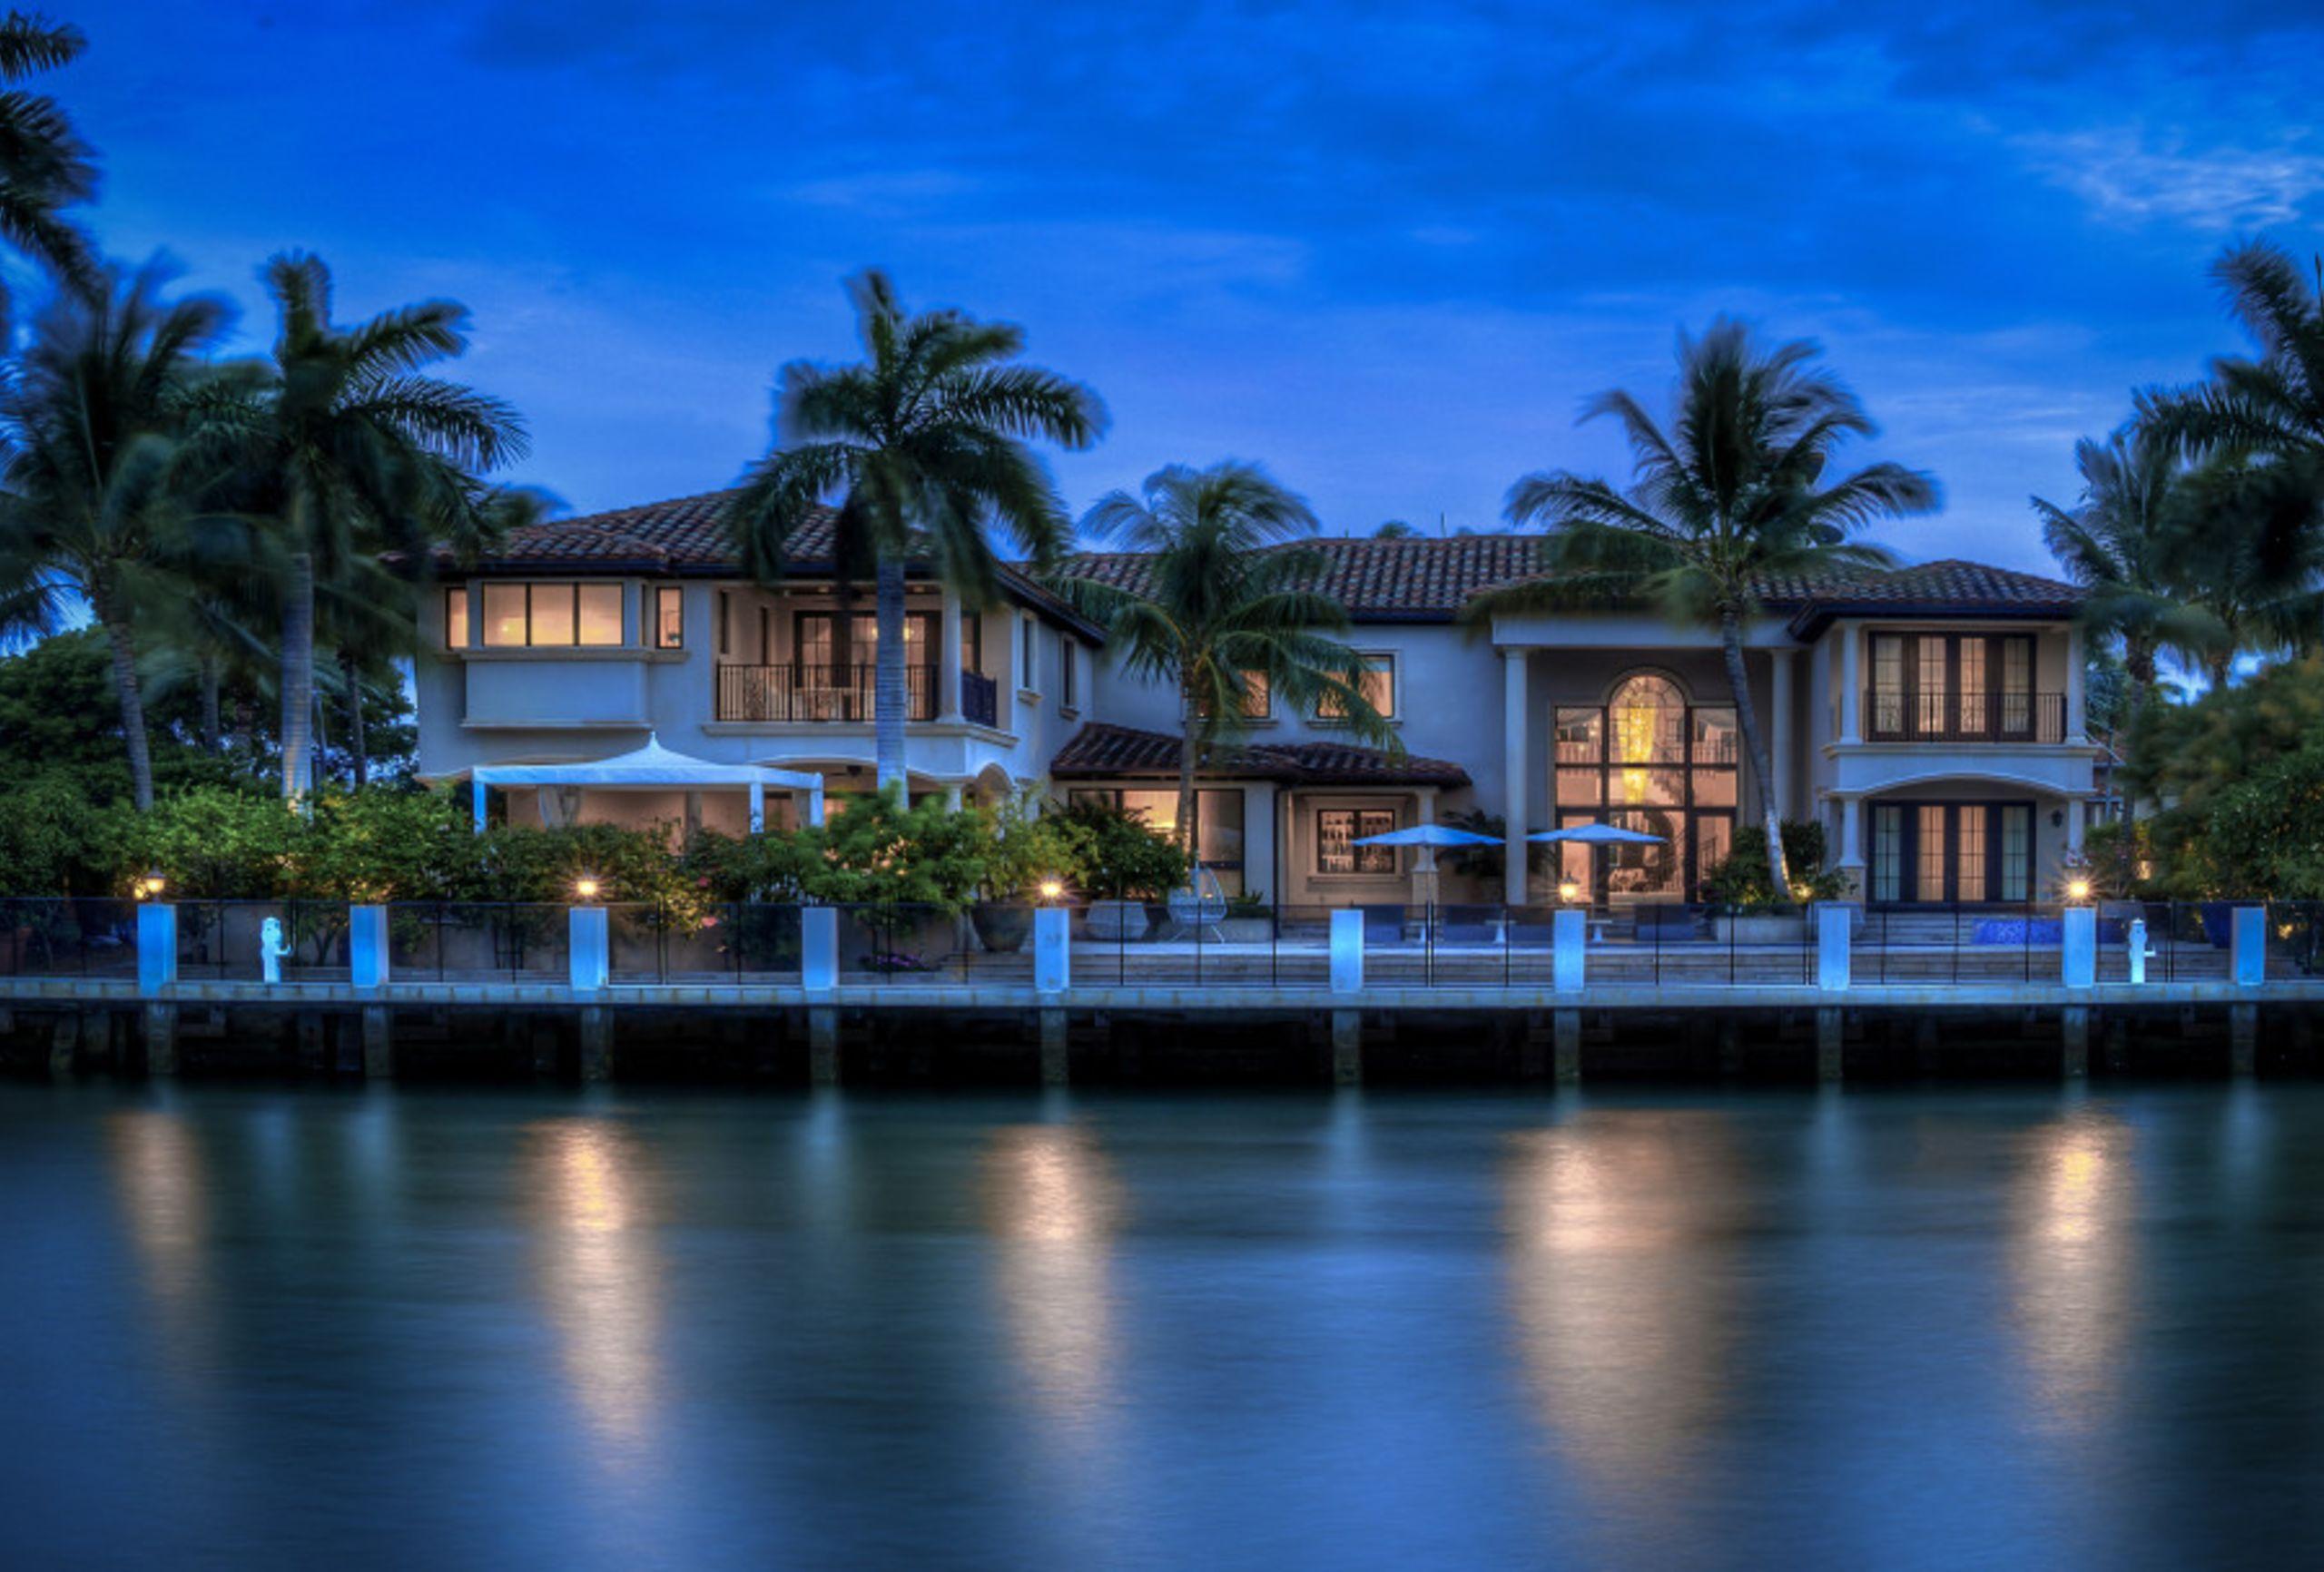 South Florida beautiful properties with amazing views